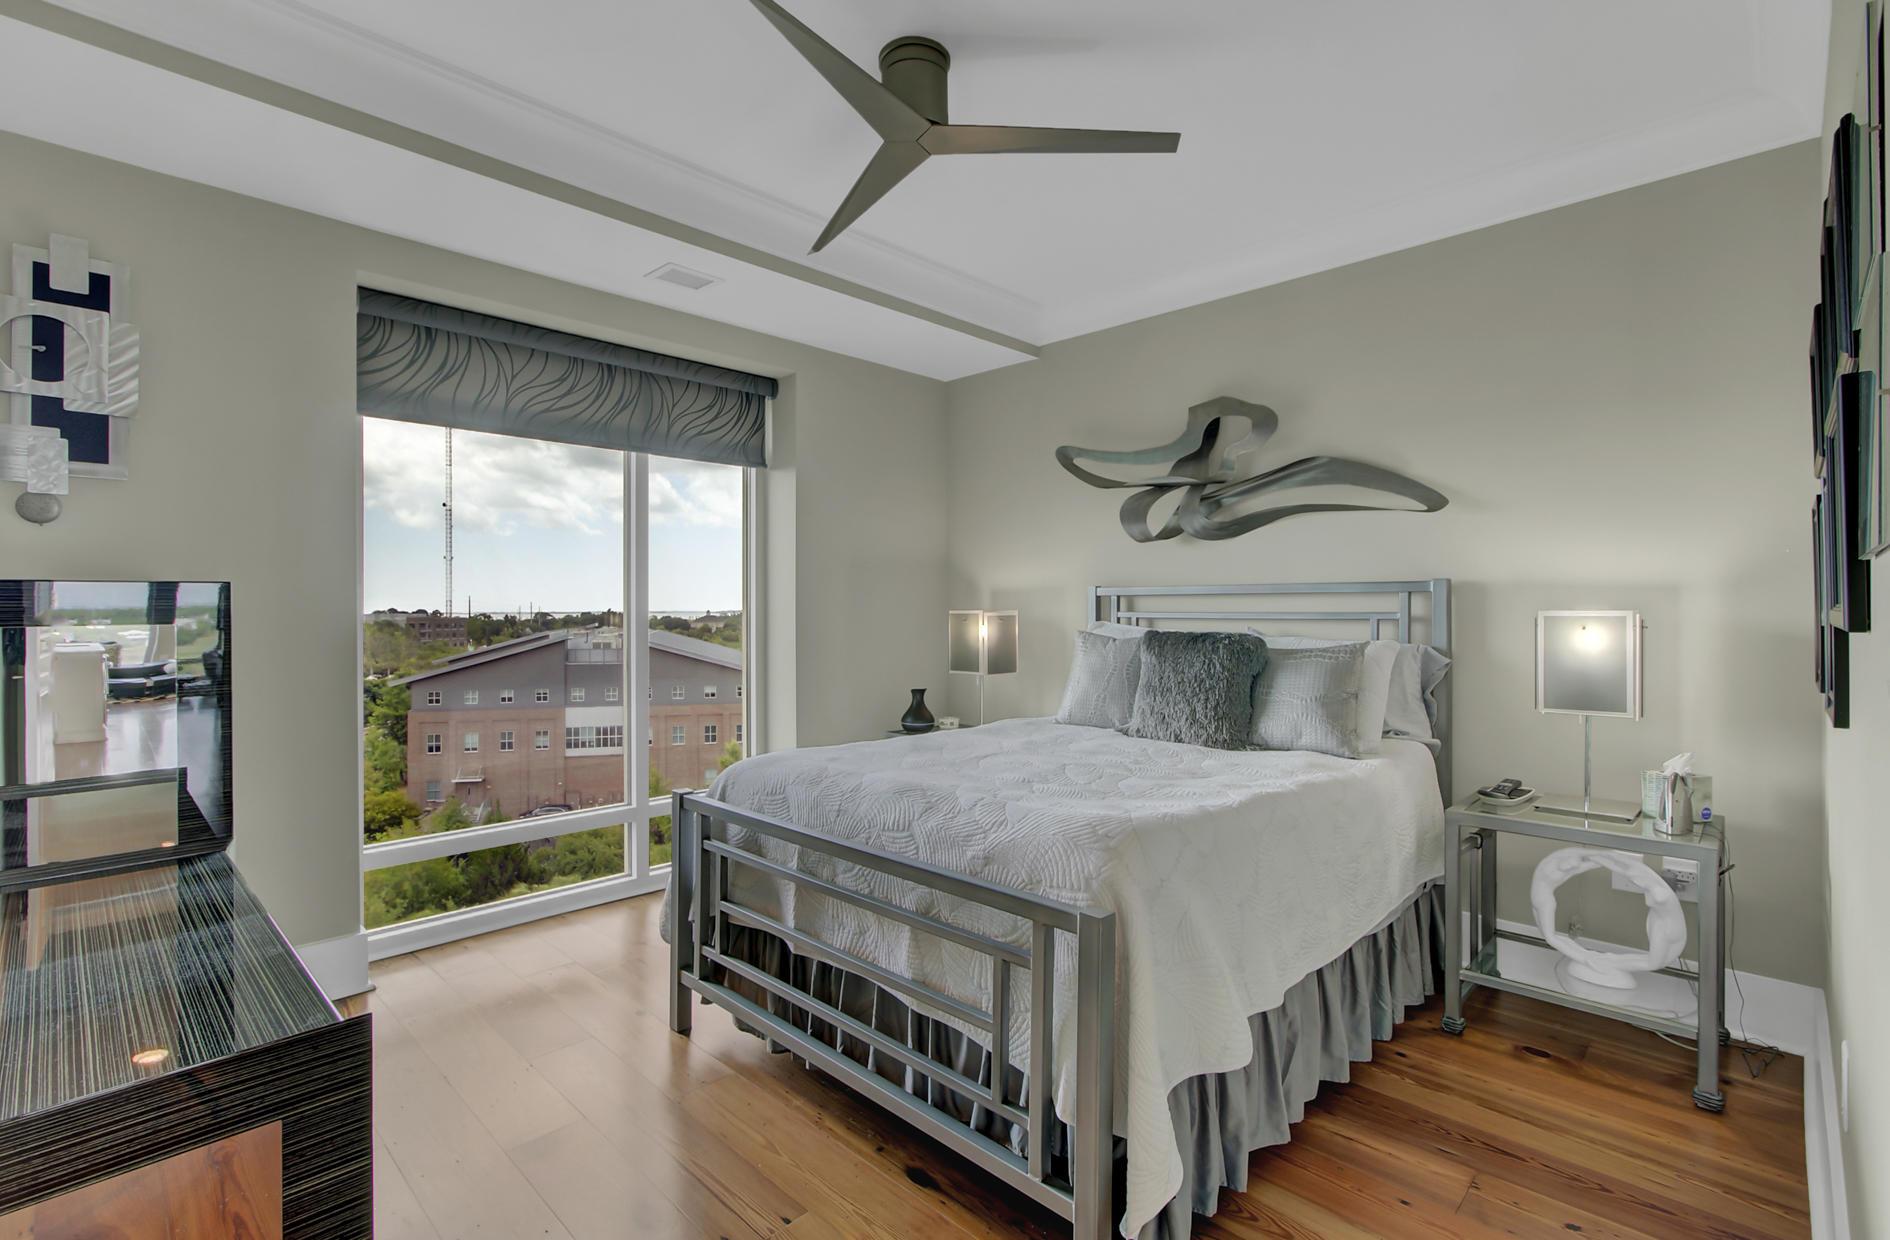 Tides IV Condominiums Homes For Sale - 155 Wingo Way, Mount Pleasant, SC - 32